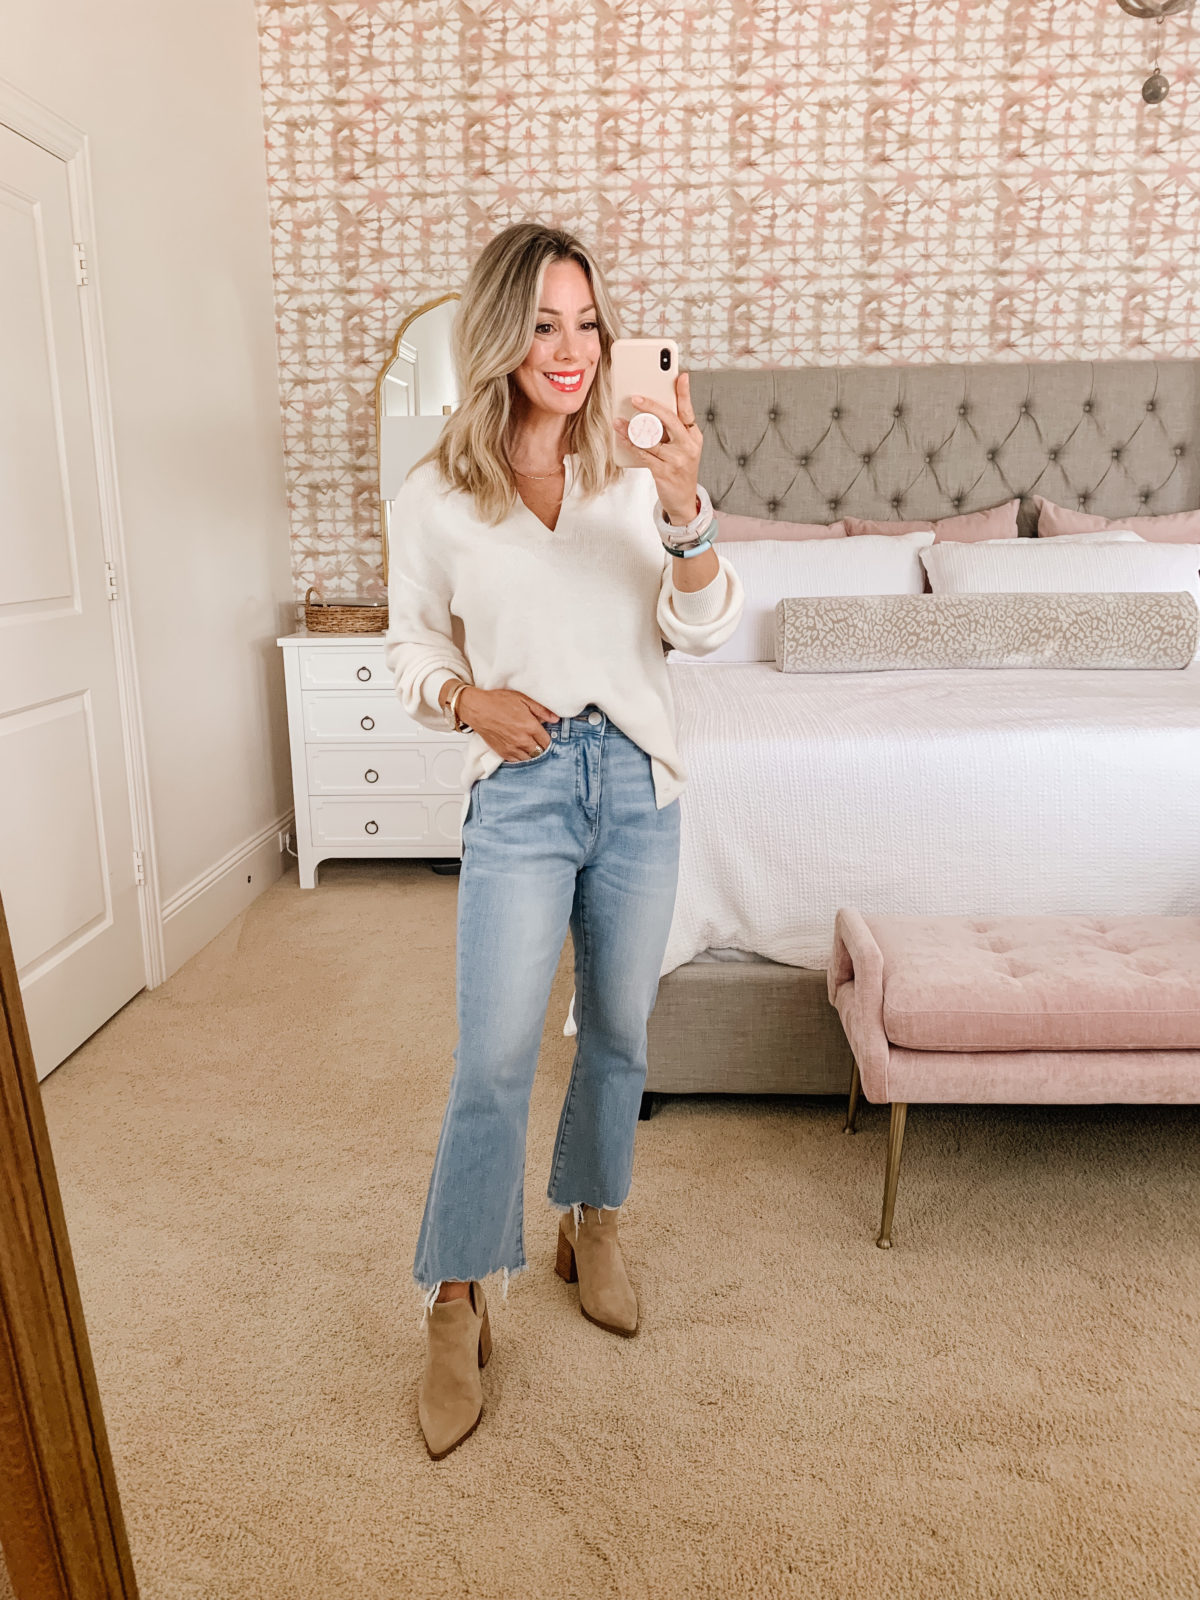 LOFT Fashion, Split Neck Sweater, Jeans, Booties